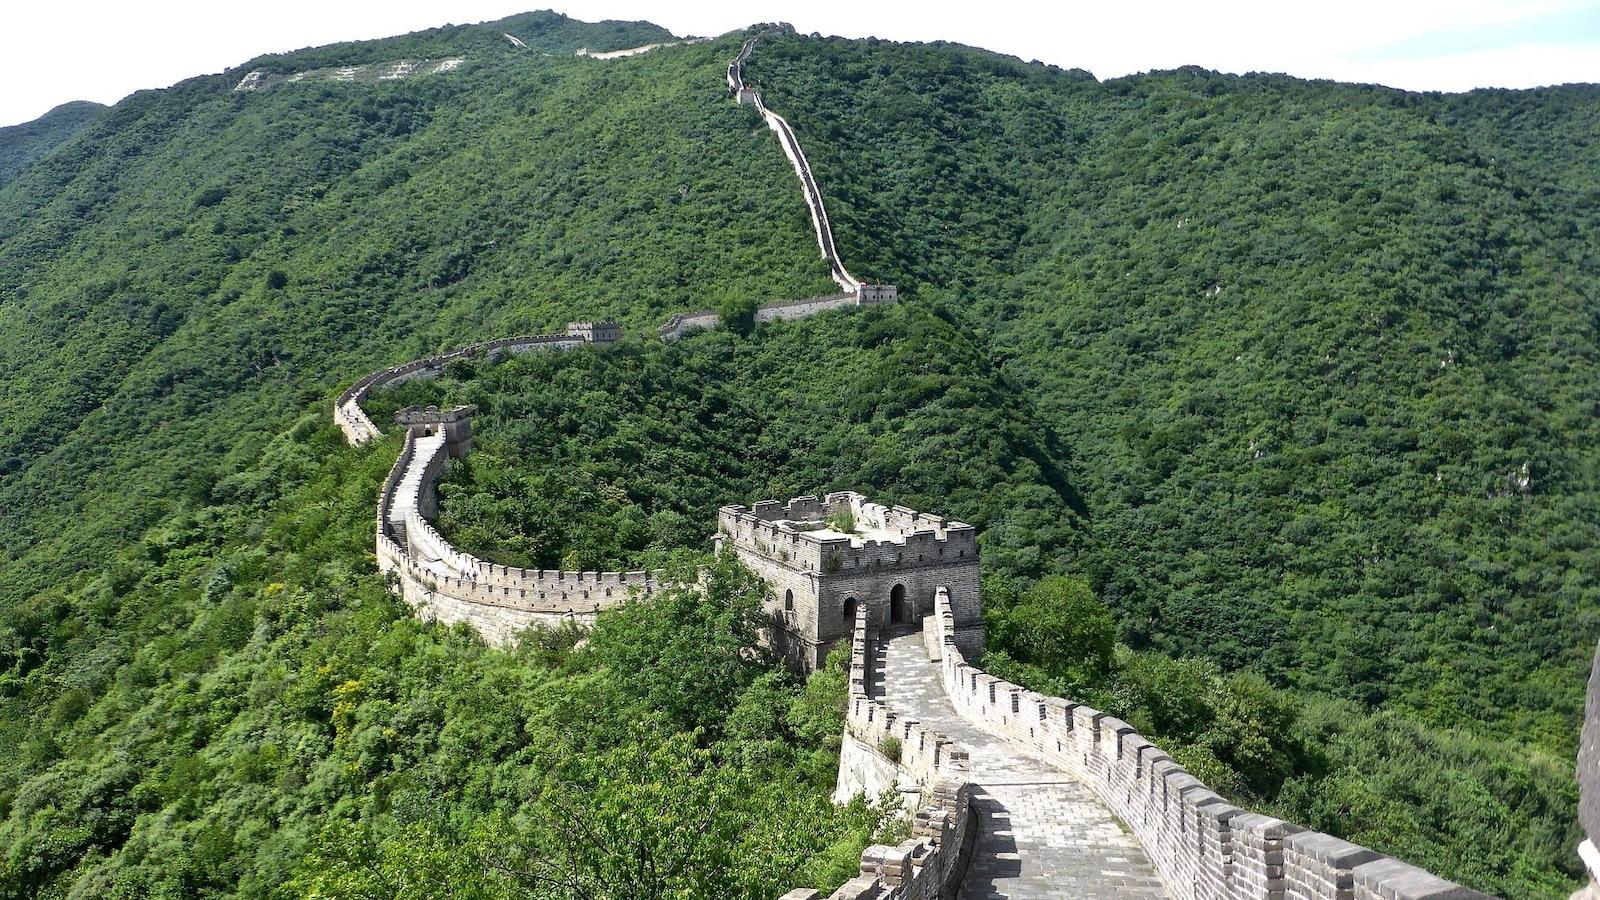 Vue de la Grande Muraille de Chine dominant la montagne.